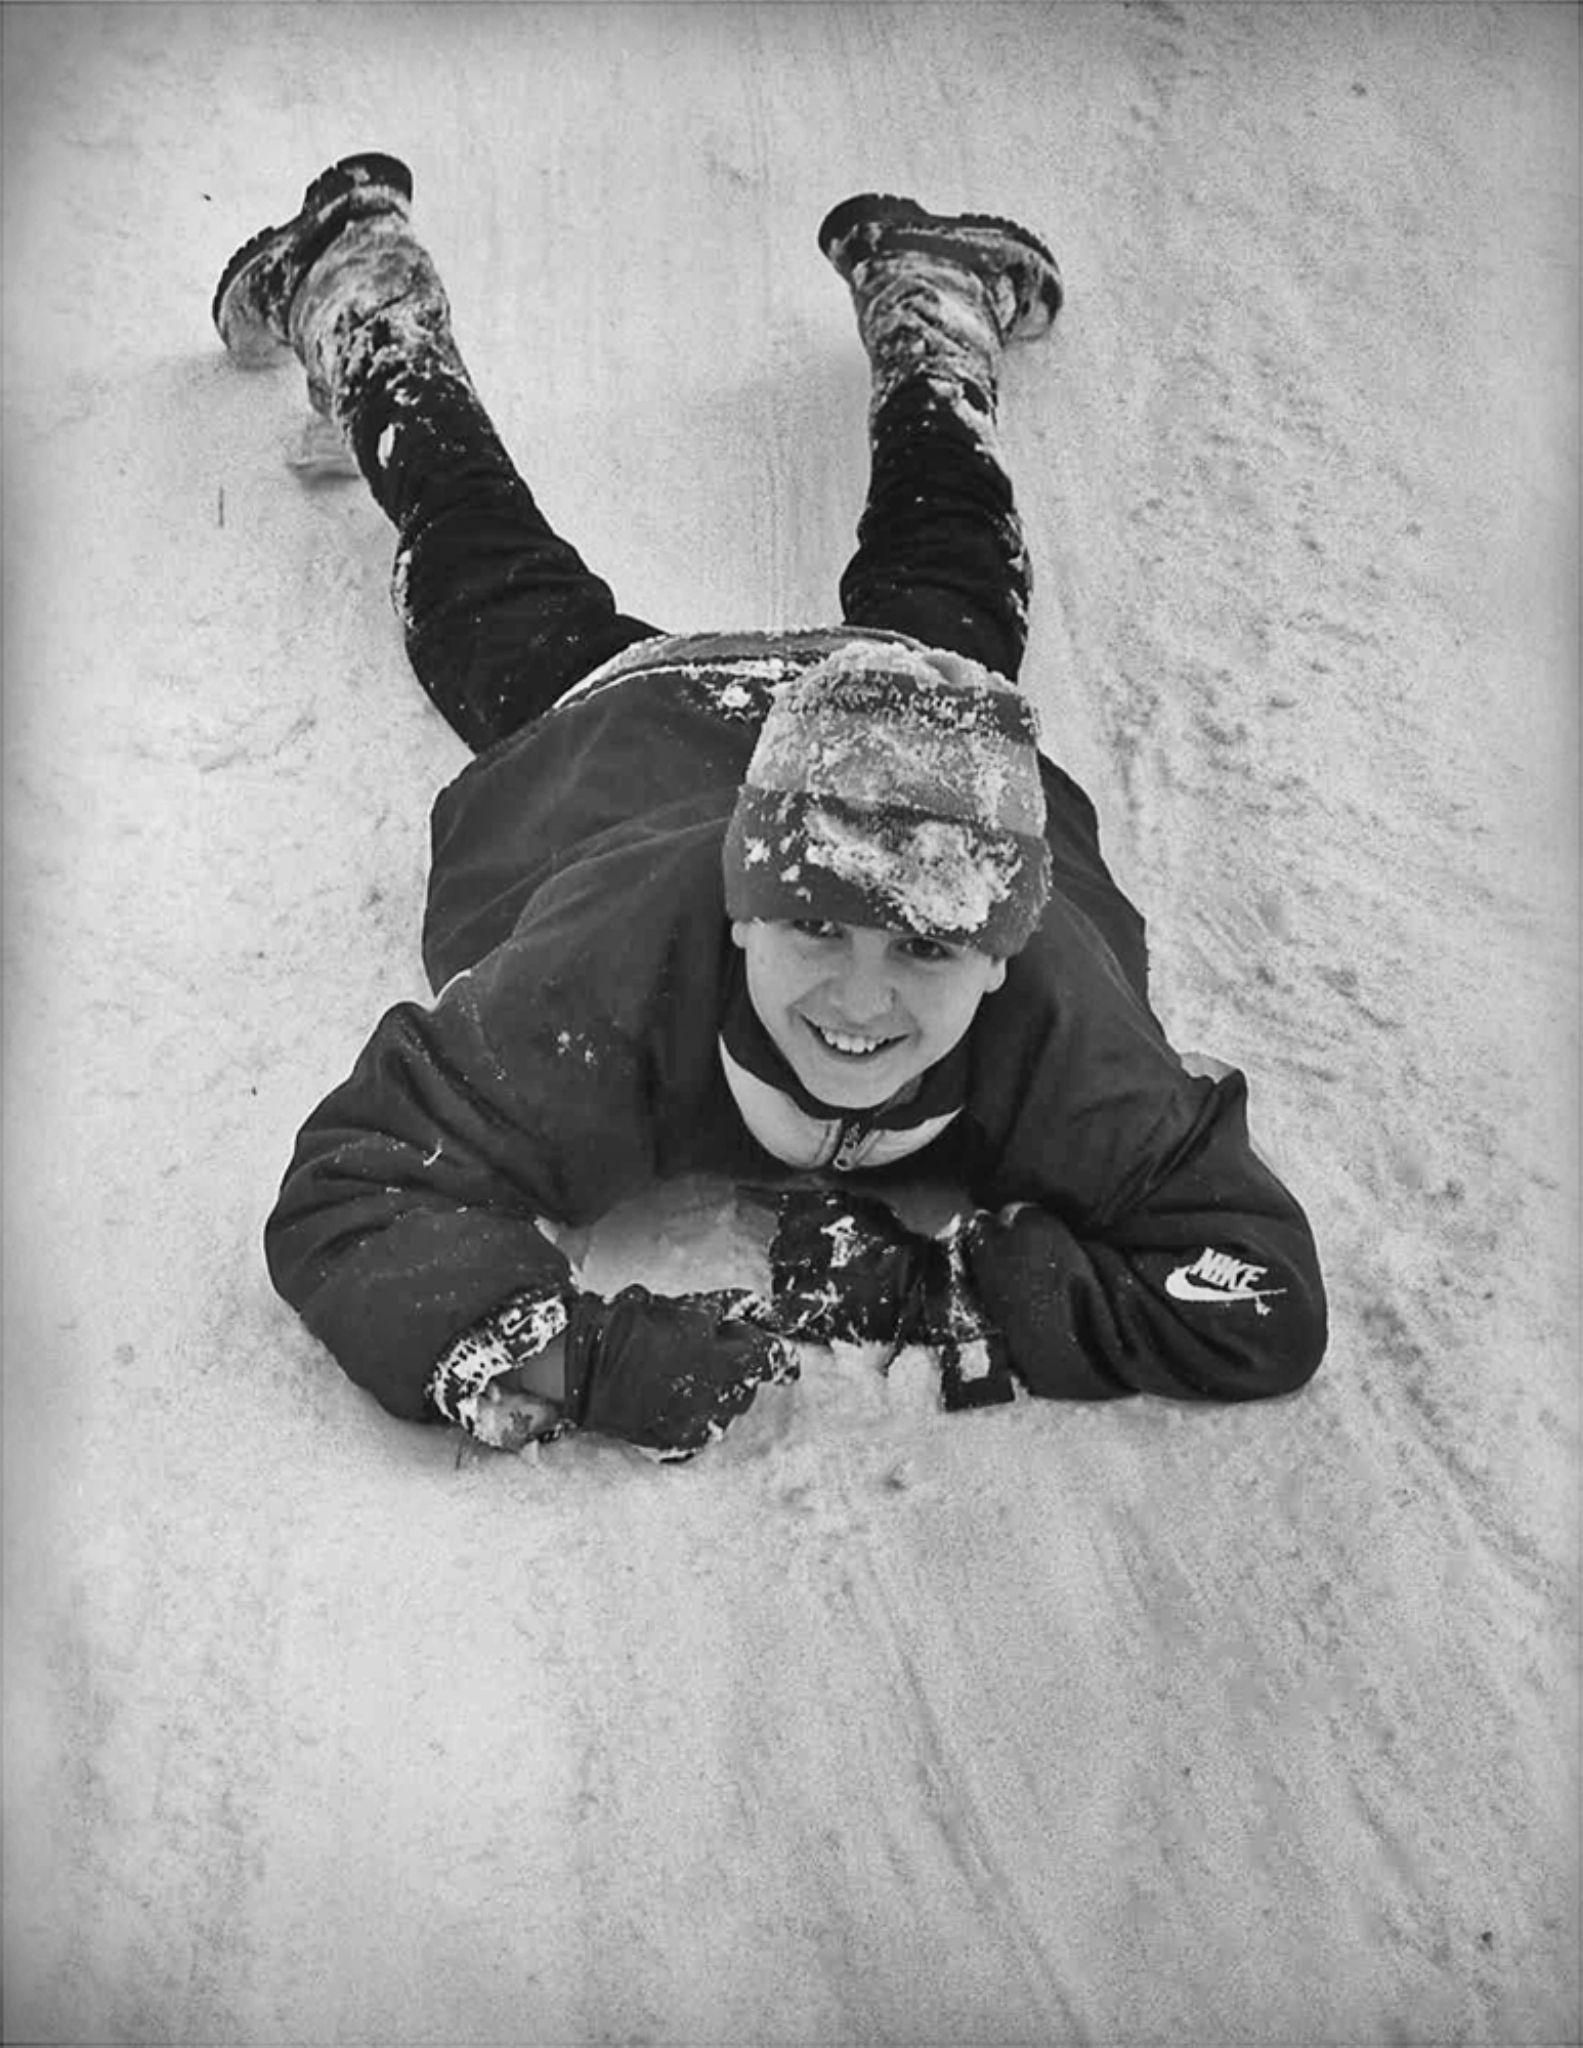 Enjoy the snow by boranfot2